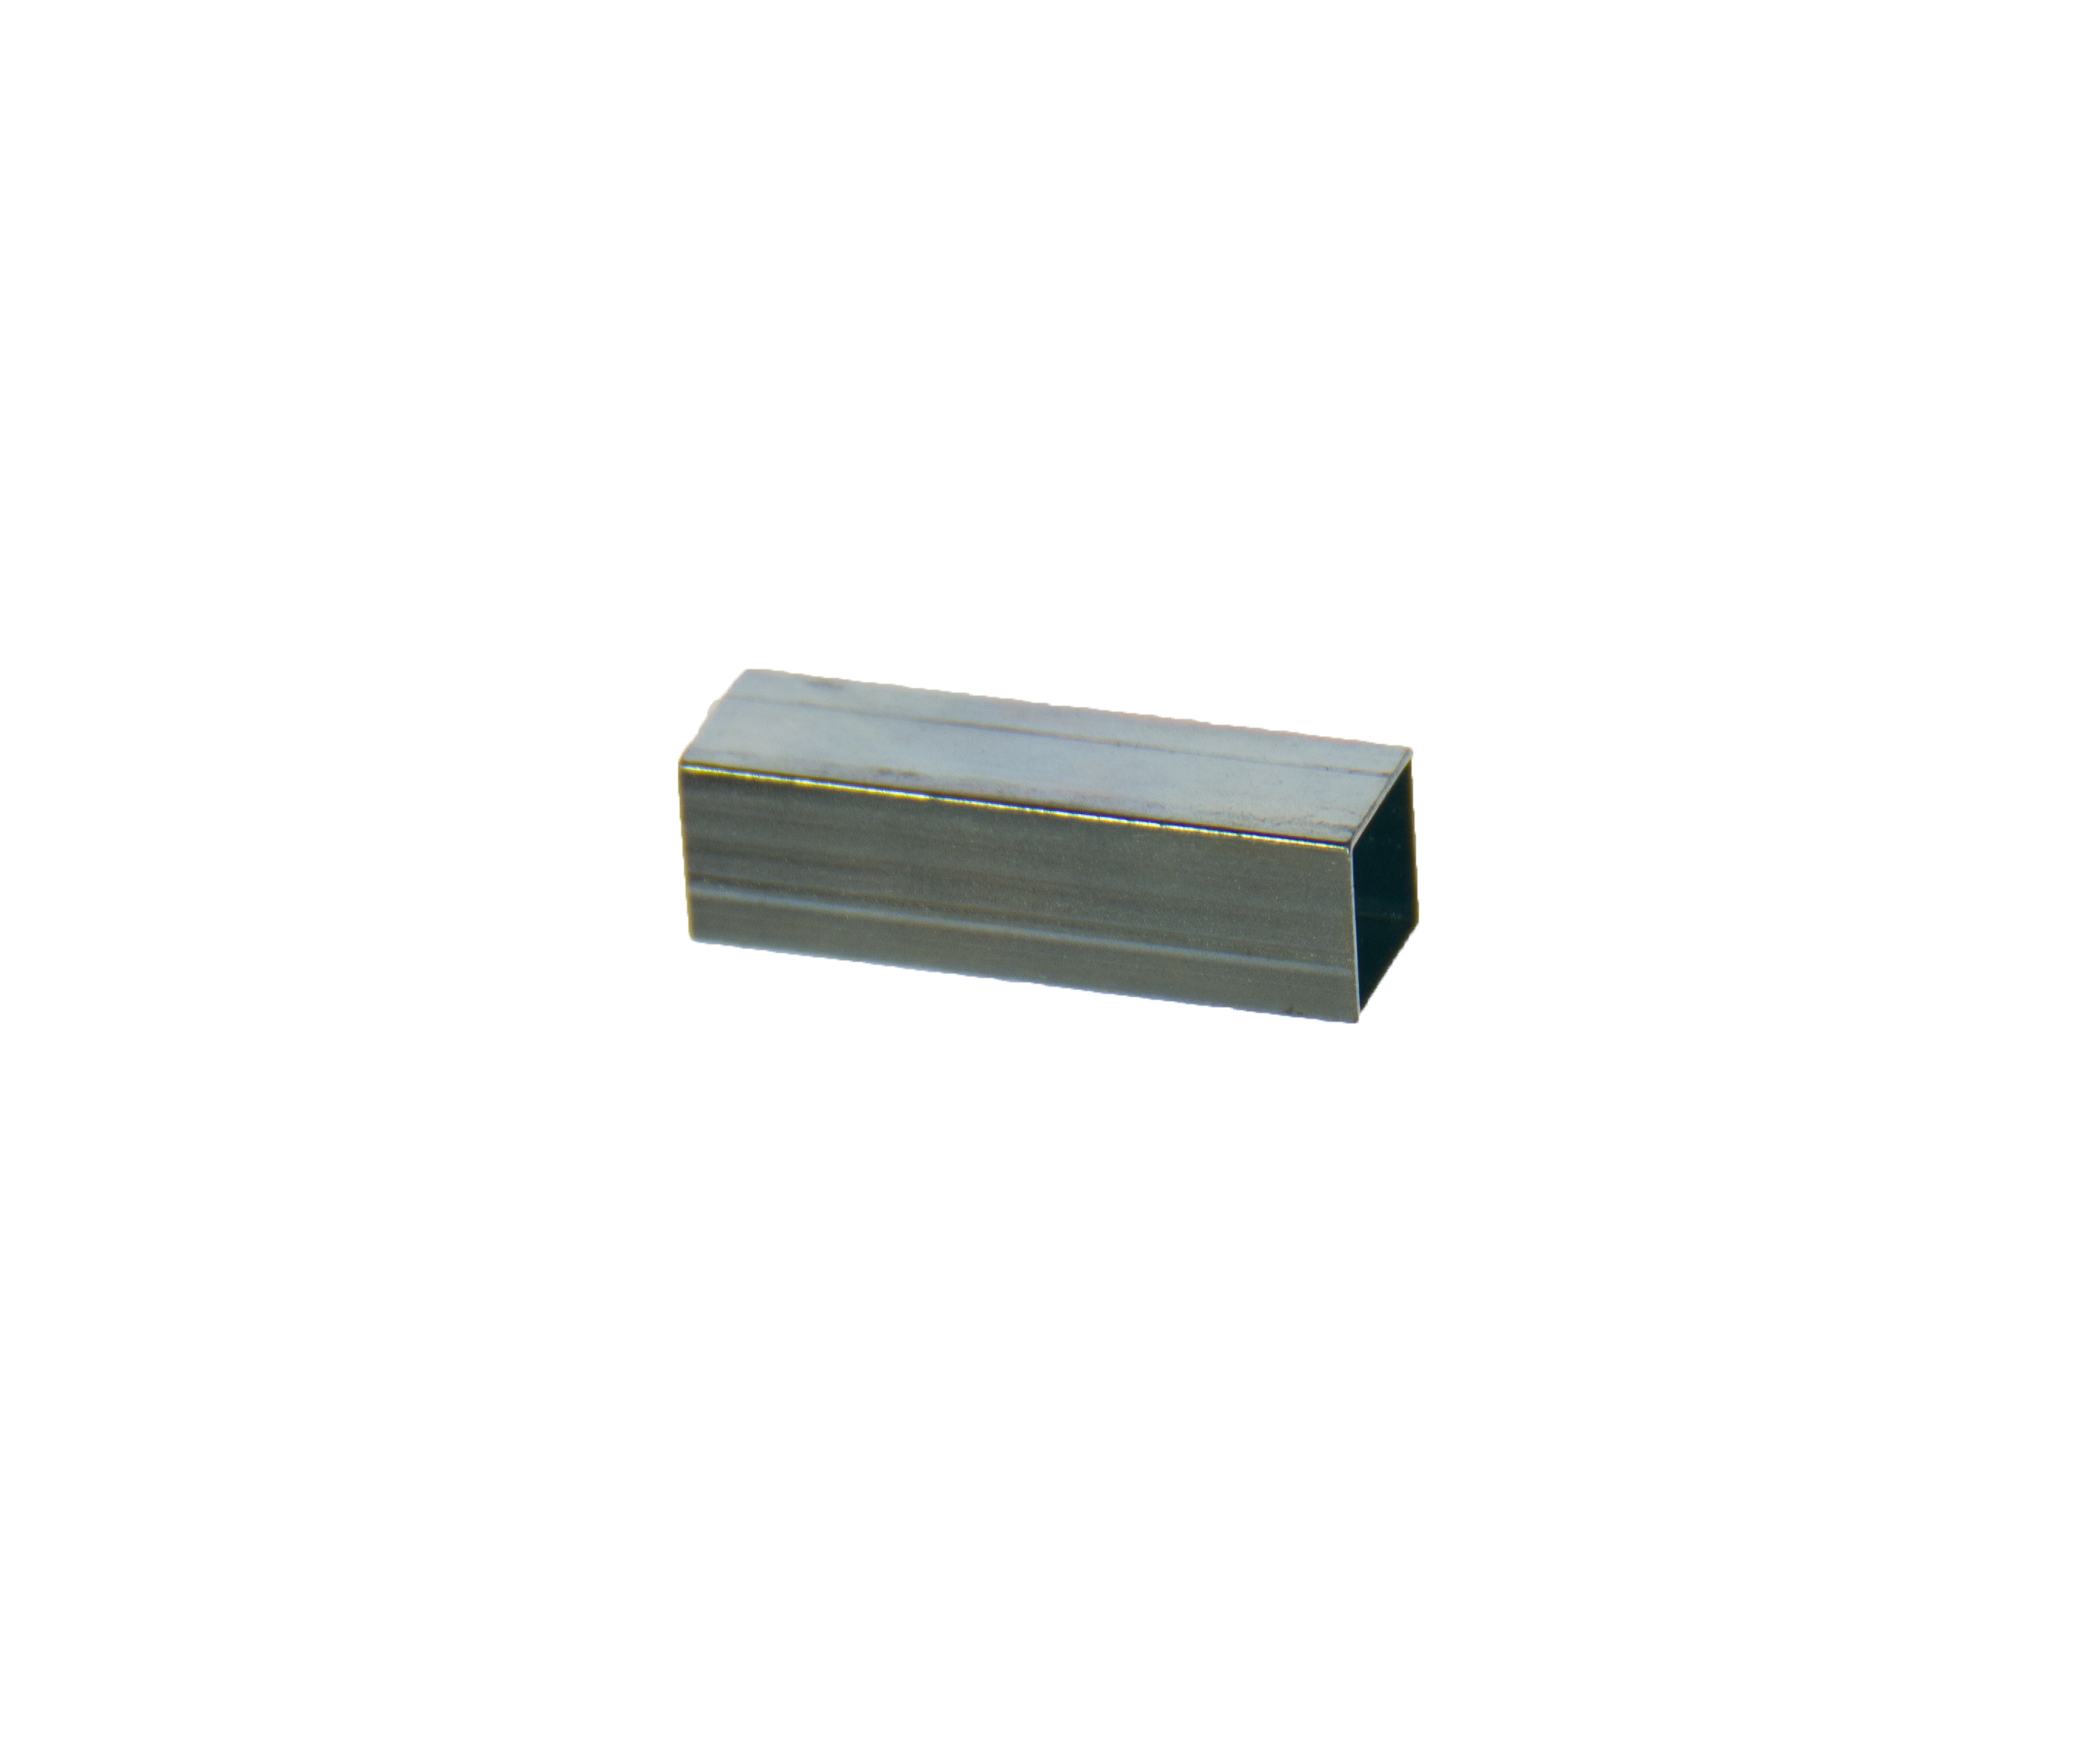 Verloophuls 8-9mm L=30mm